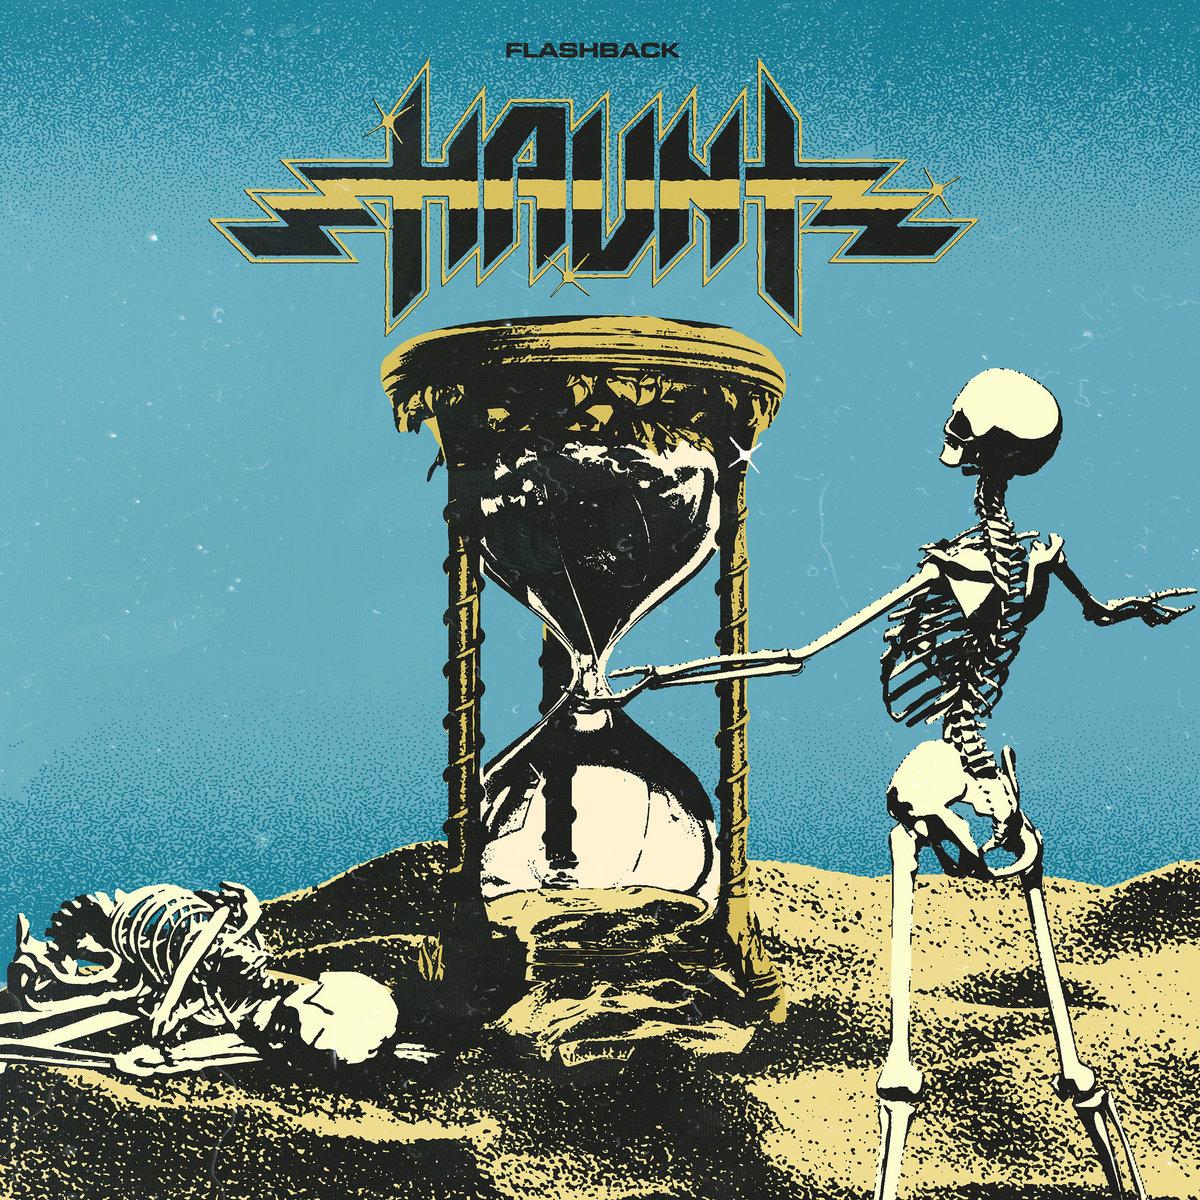 HAUNT - Flashback cover